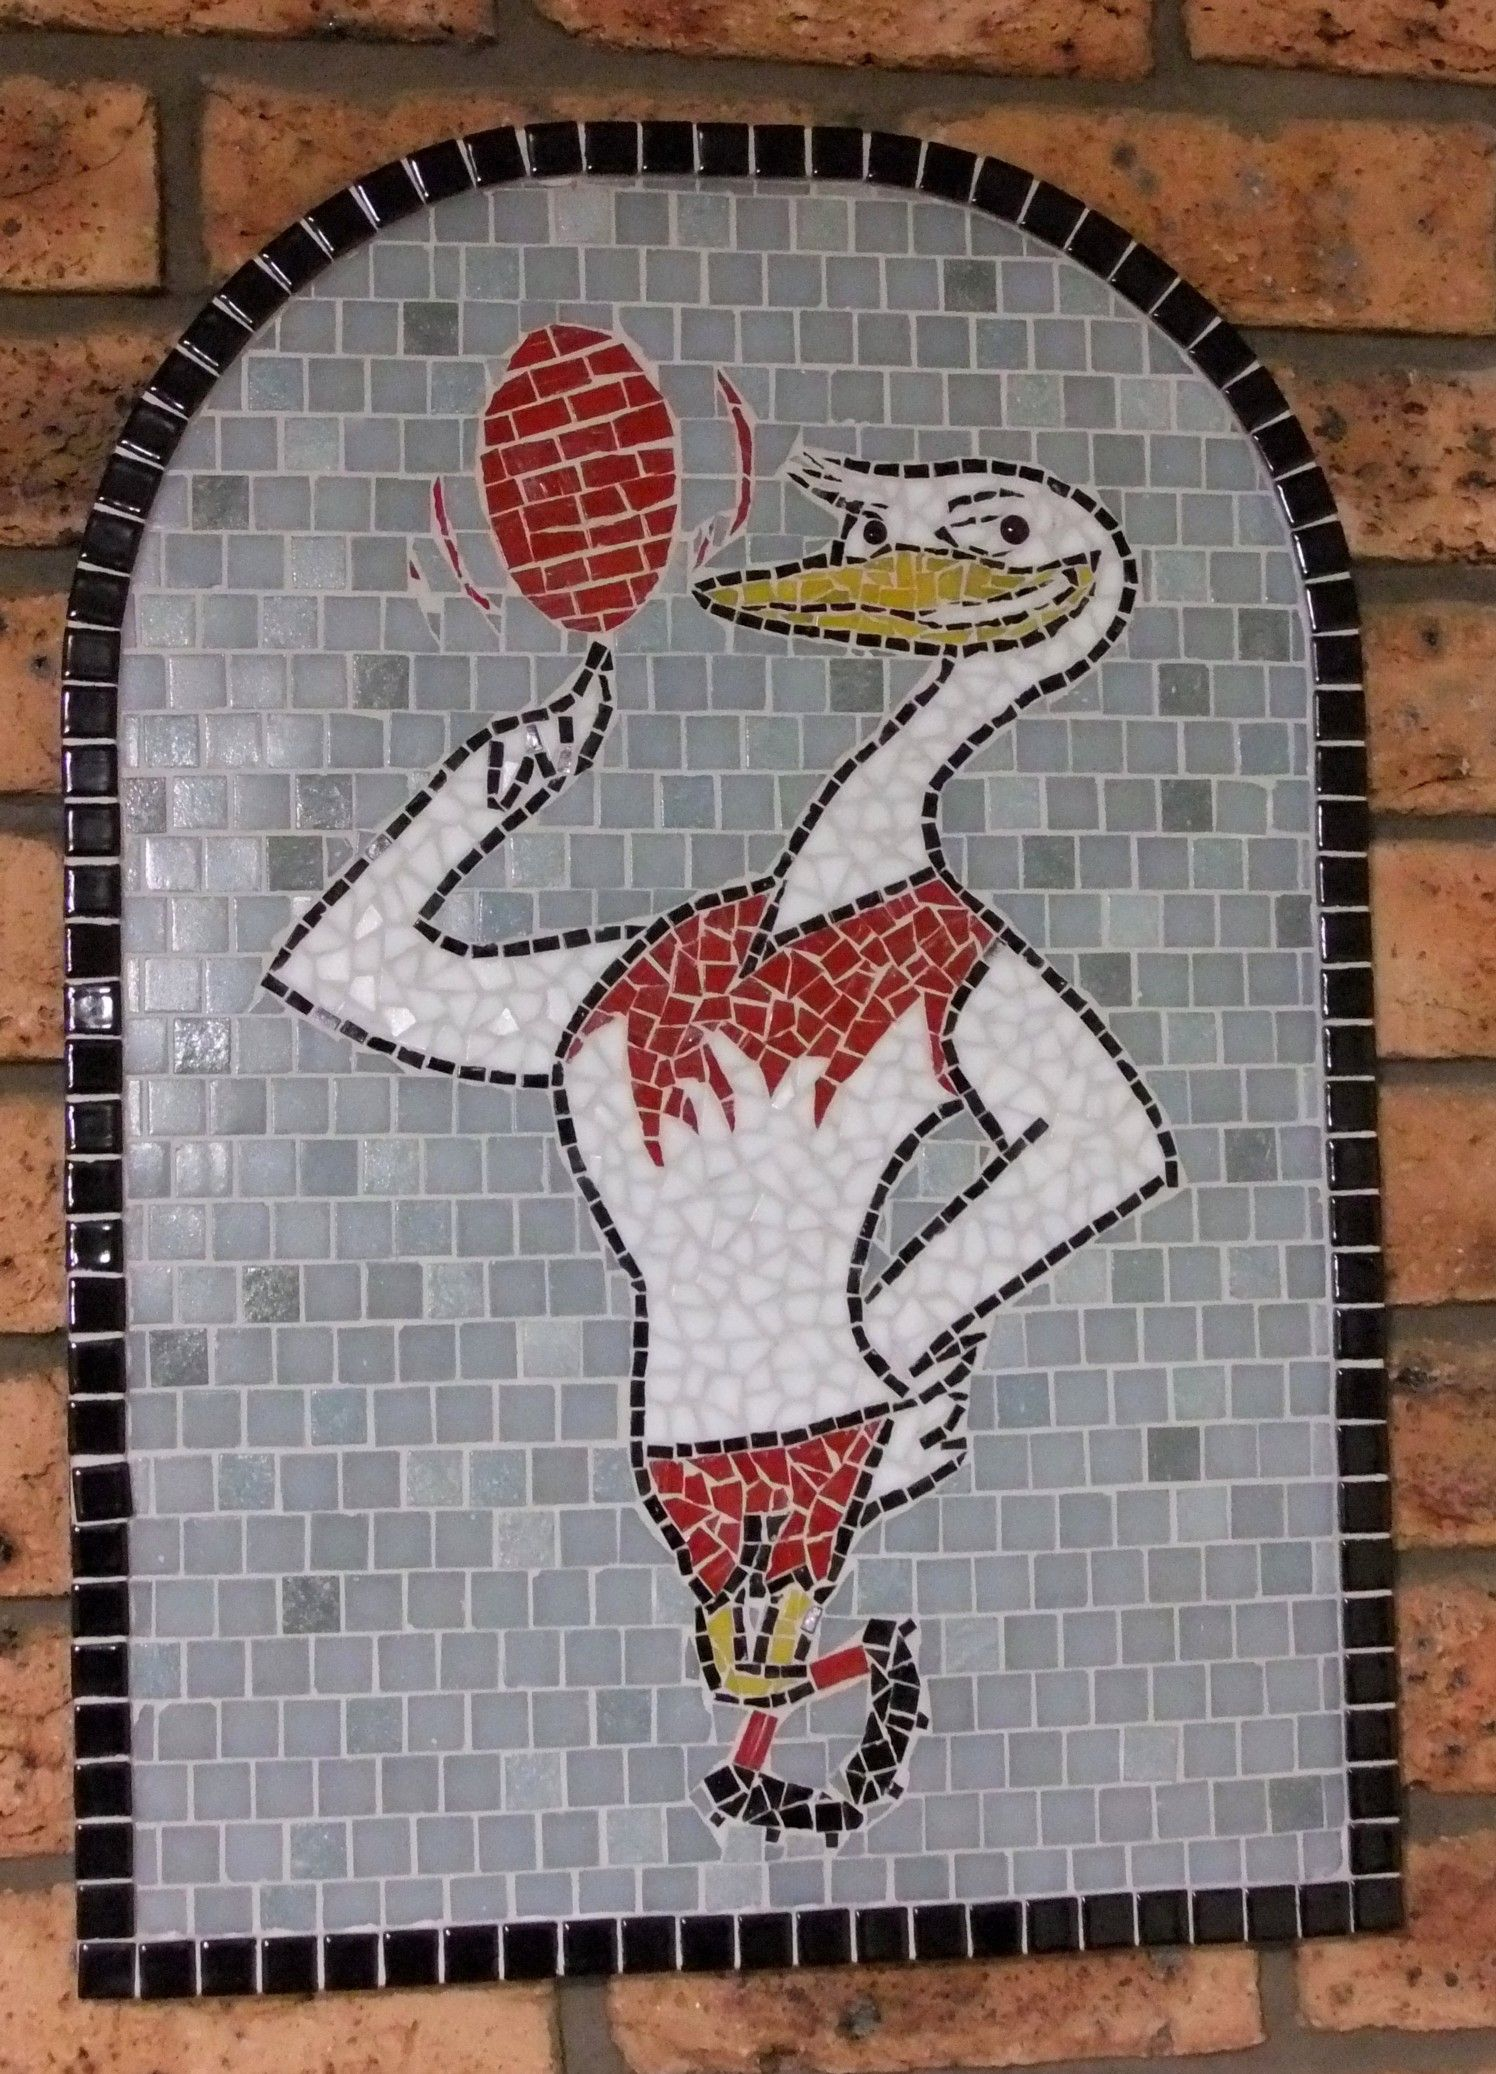 Mosaic Sydney Swans